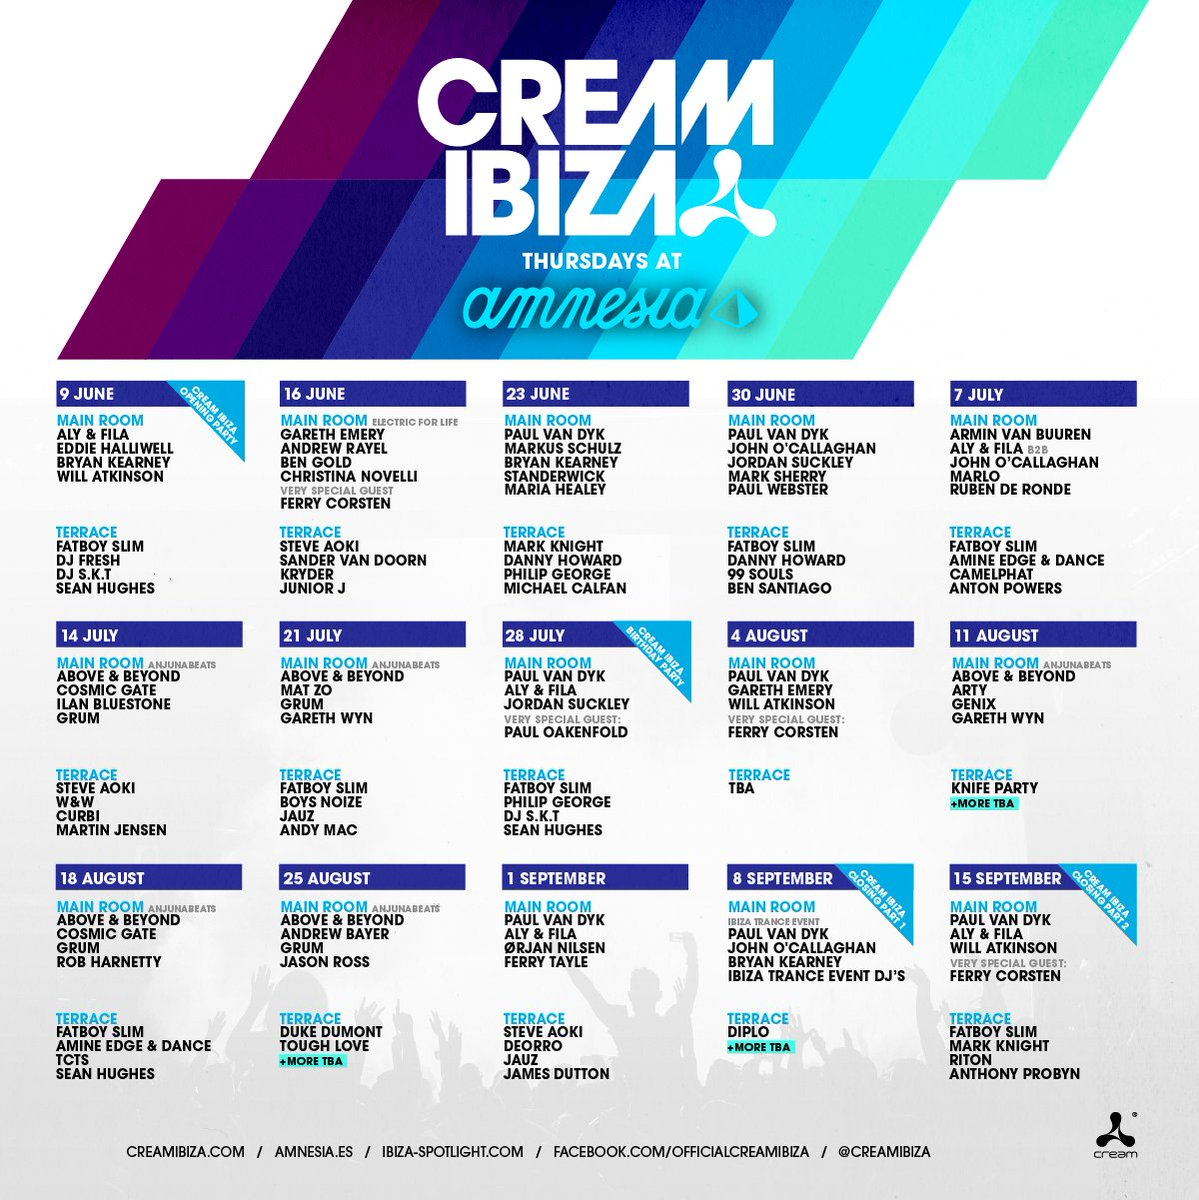 #CreamIbiza2016 https://t.co/RdHieQ00H1